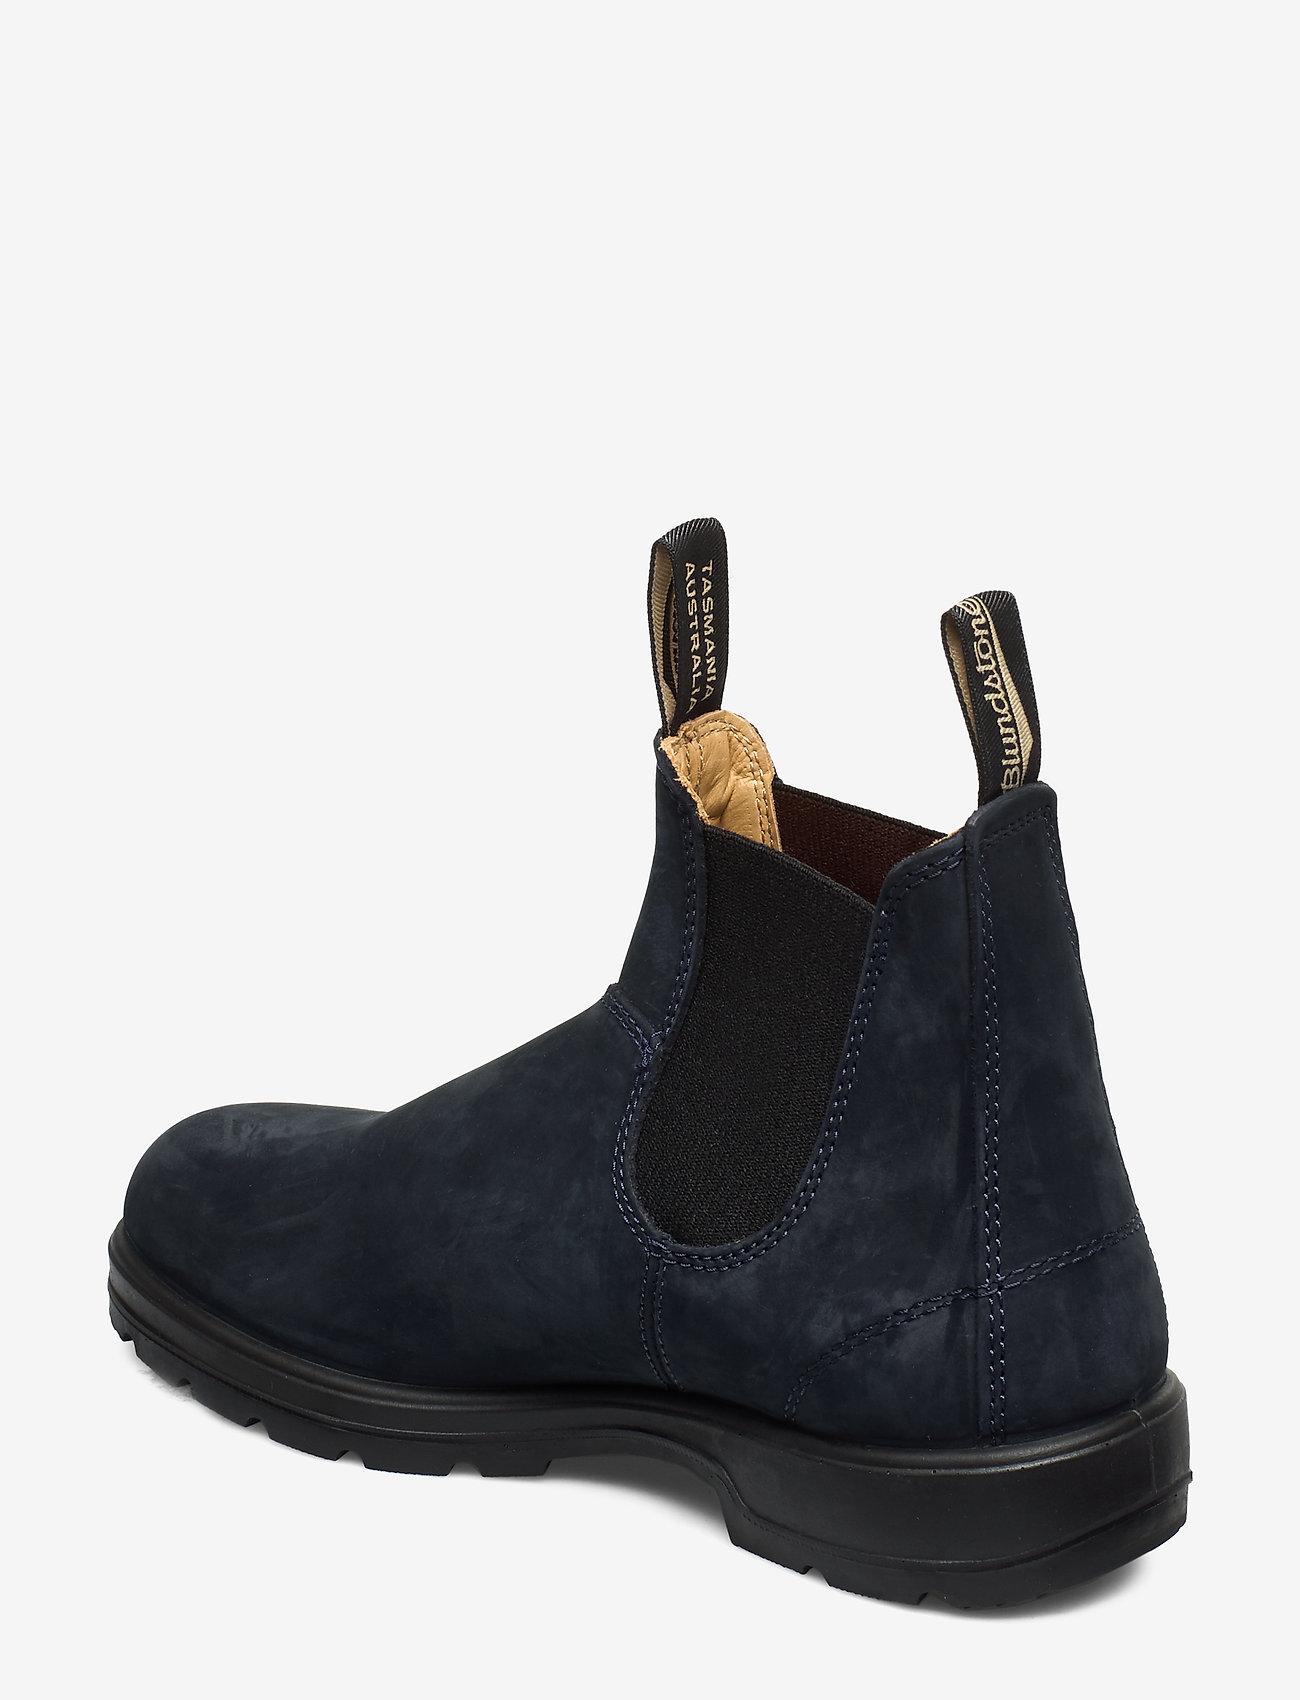 Bl Elastic Side Boot Lined (Navy Nubuck) (1500 kr) - Blundstone